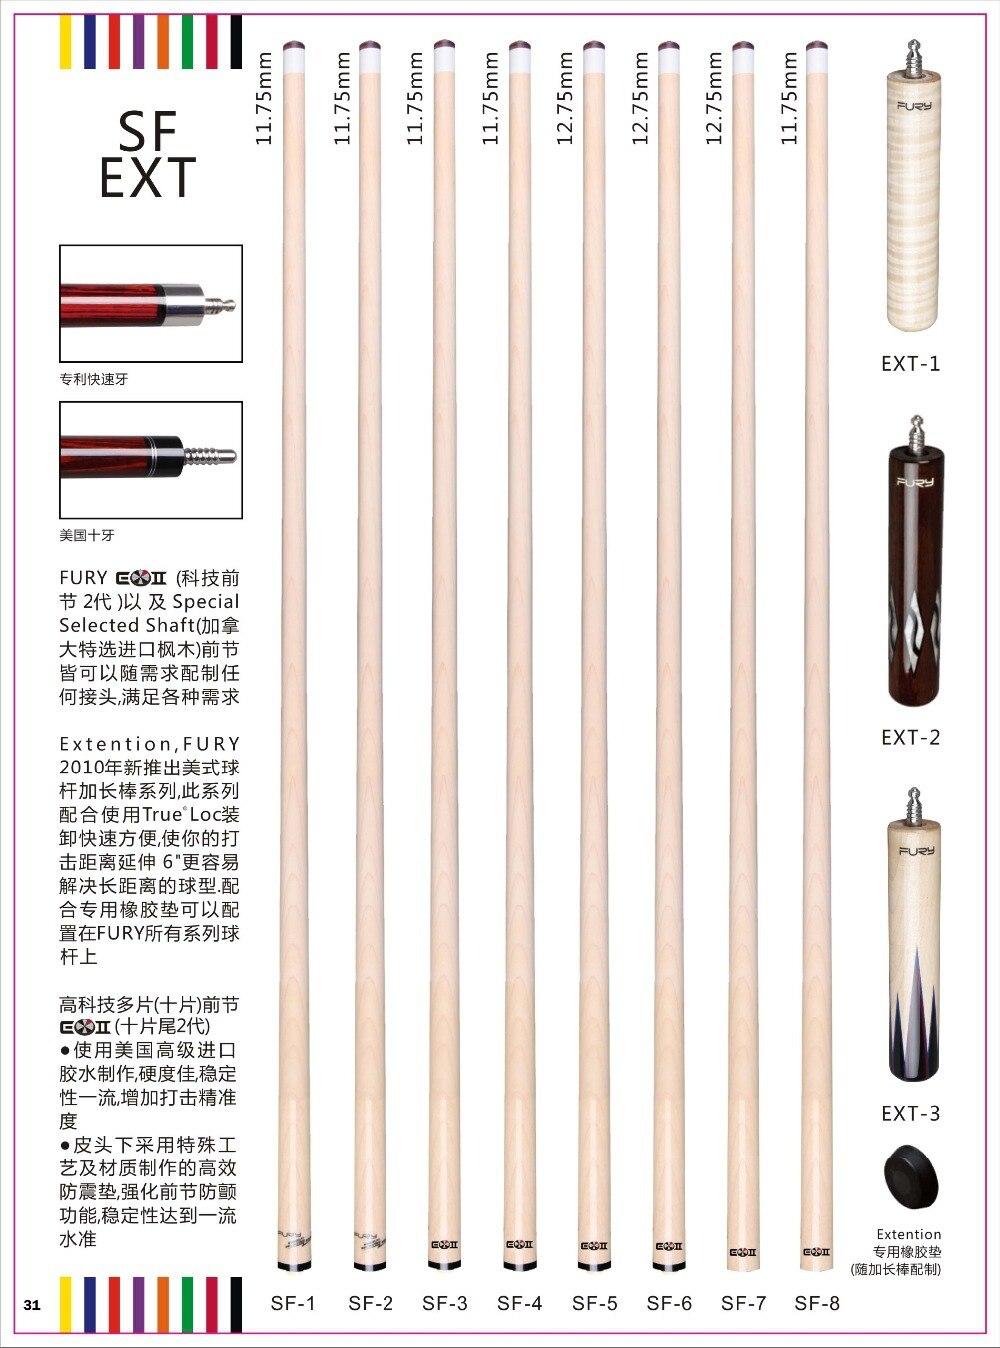 Fury cue shafts Extra shaft 11.75 mm / 12.75 mm / Billiards shaft for Full all seriesFury cue shafts Extra shaft 11.75 mm / 12.75 mm / Billiards shaft for Full all series